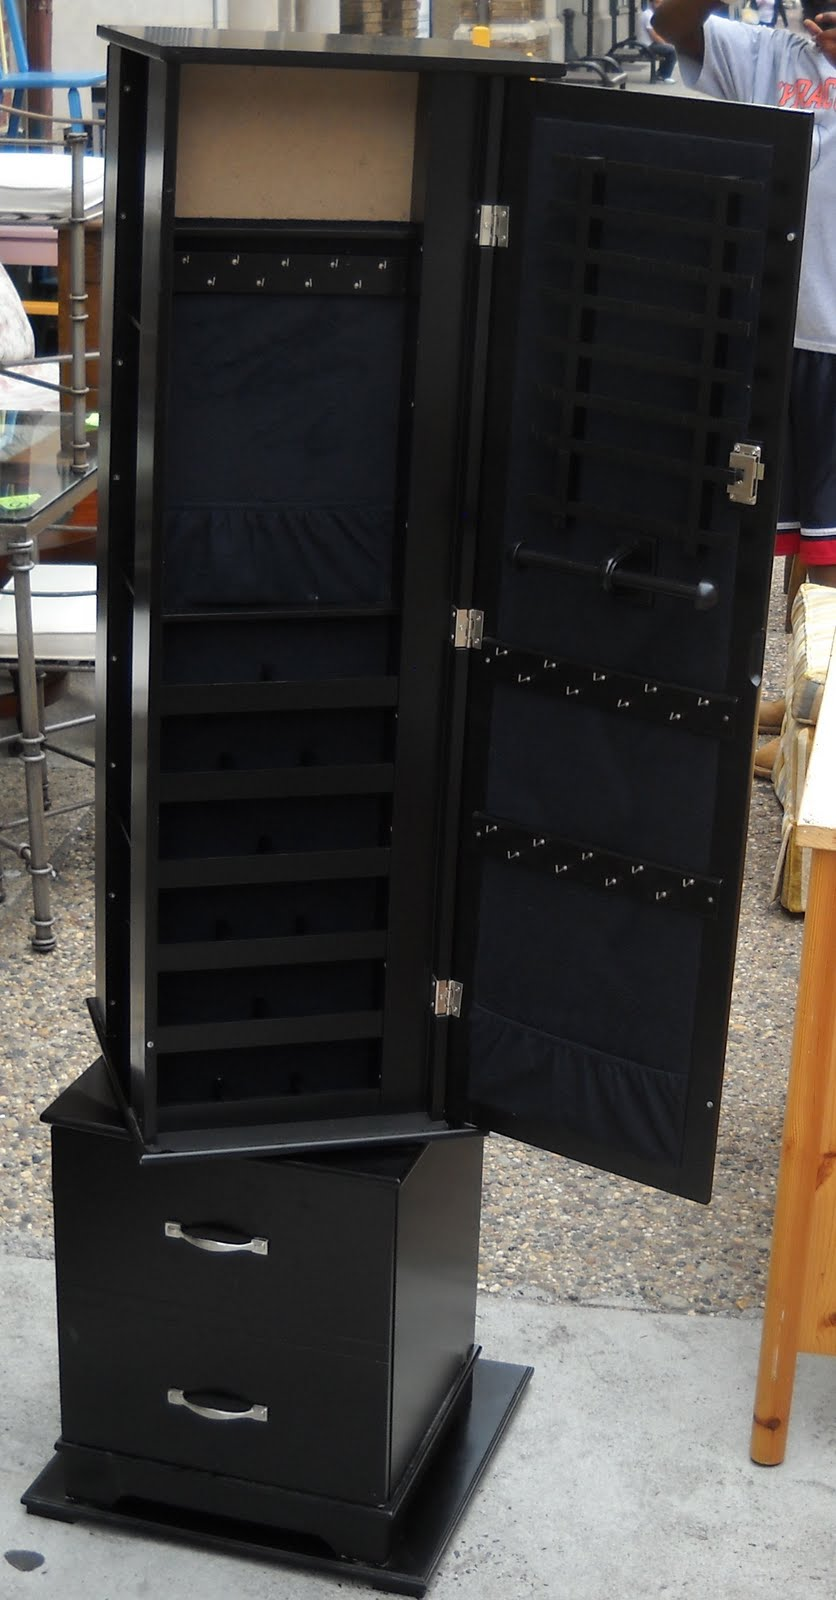 Uhuru Furniture & Collectibles: Black Jewelry Armoire SOLD